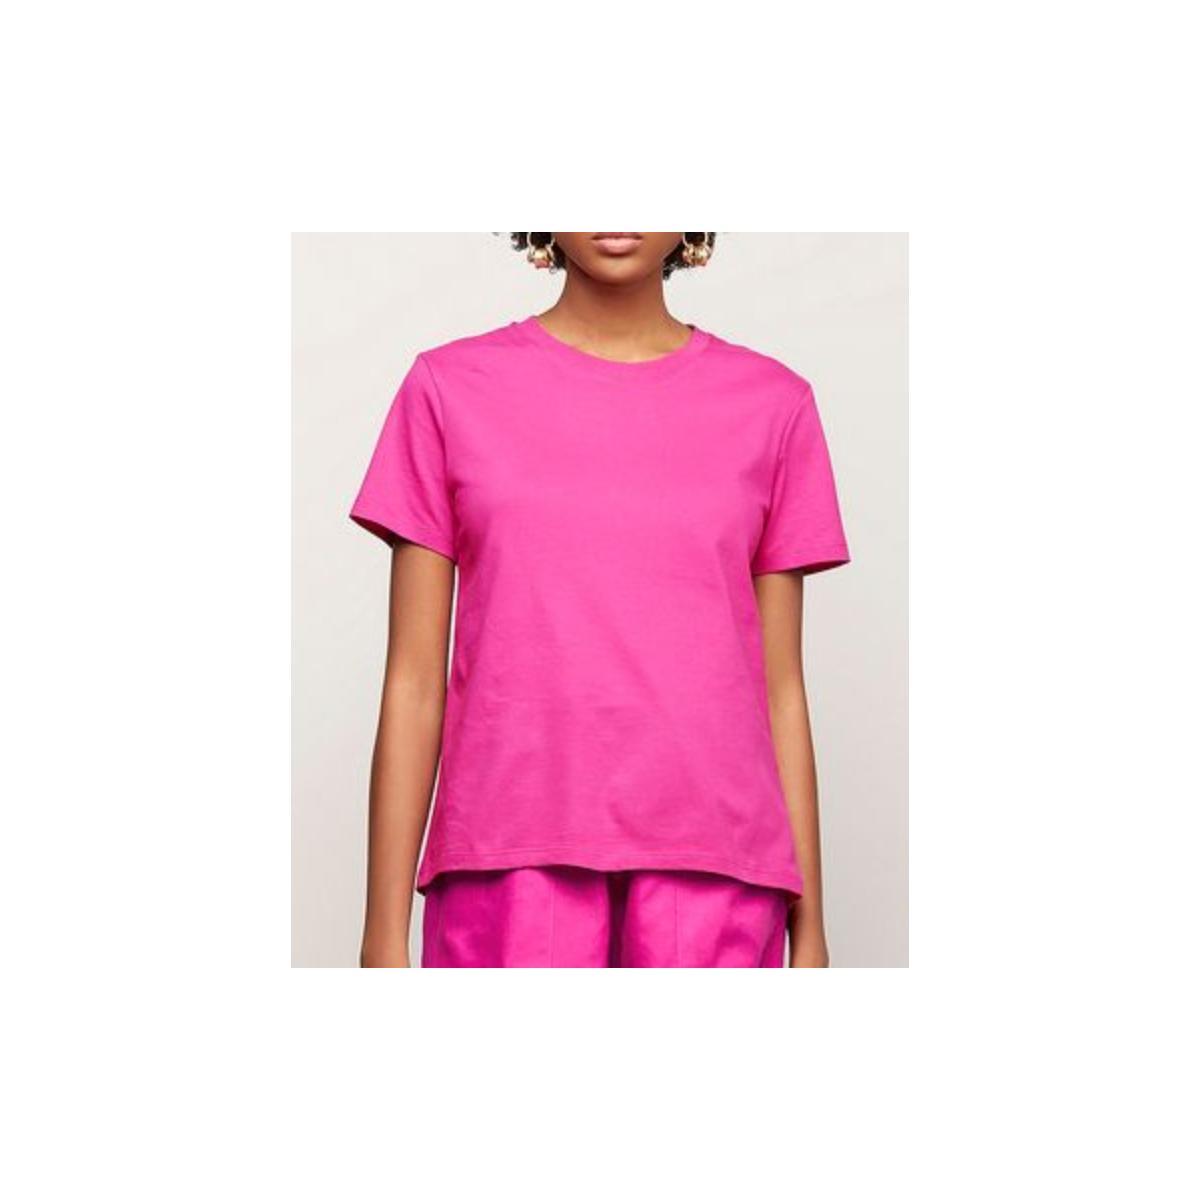 Blusa Feminina Dzarm 6rzq K37en  Pink